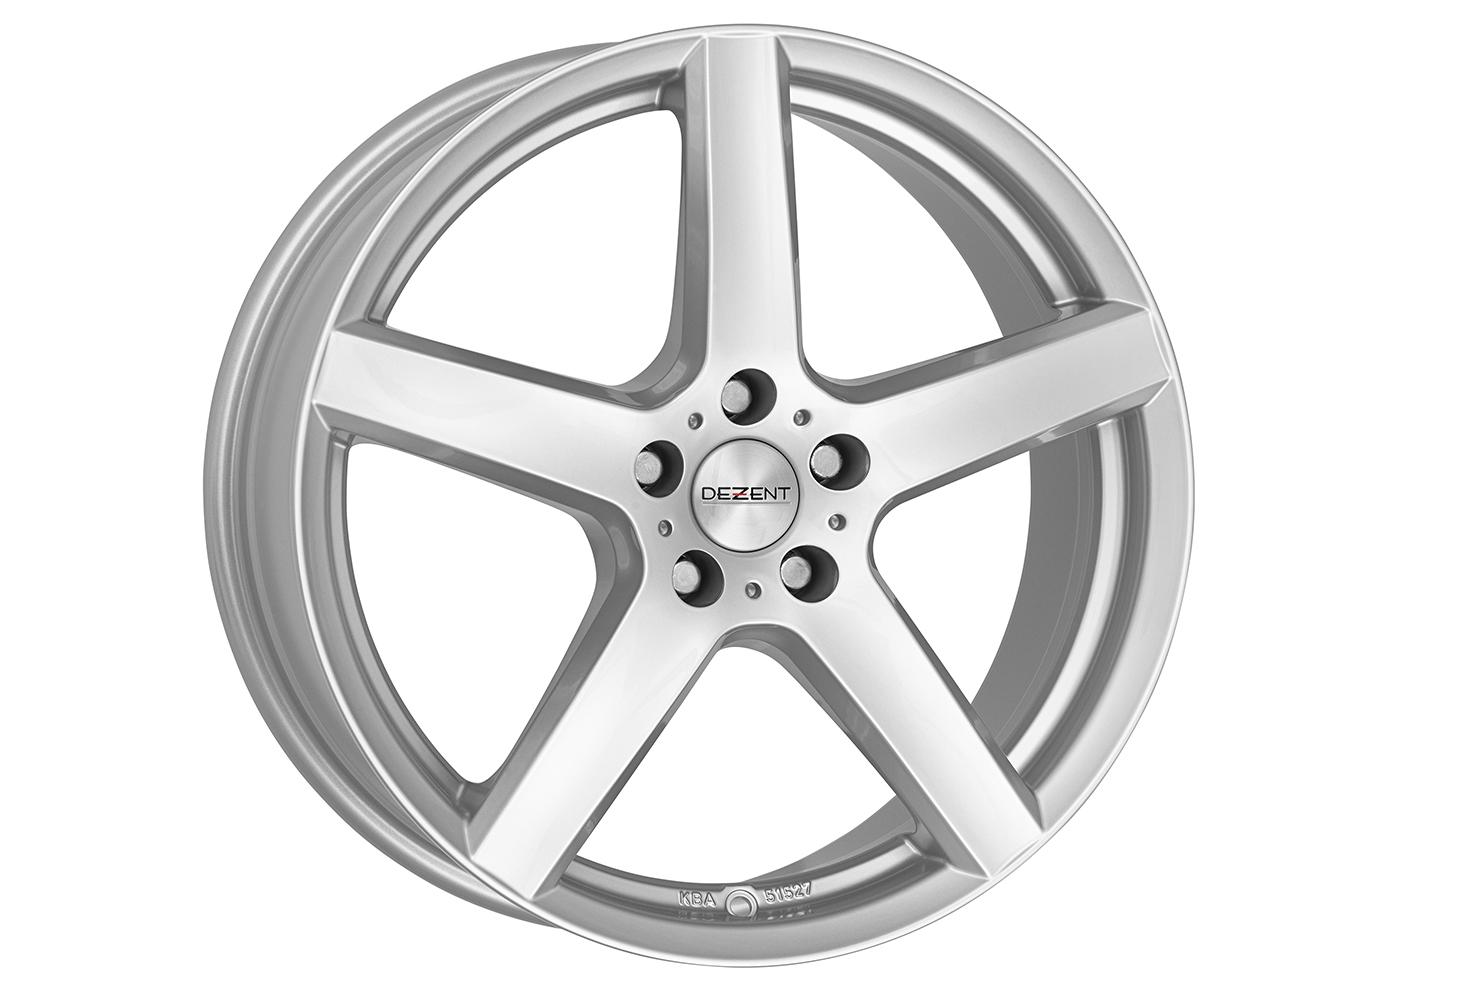 Dezent Ty 600x15 4x1000 Et 38 Felgi Aluminiowe